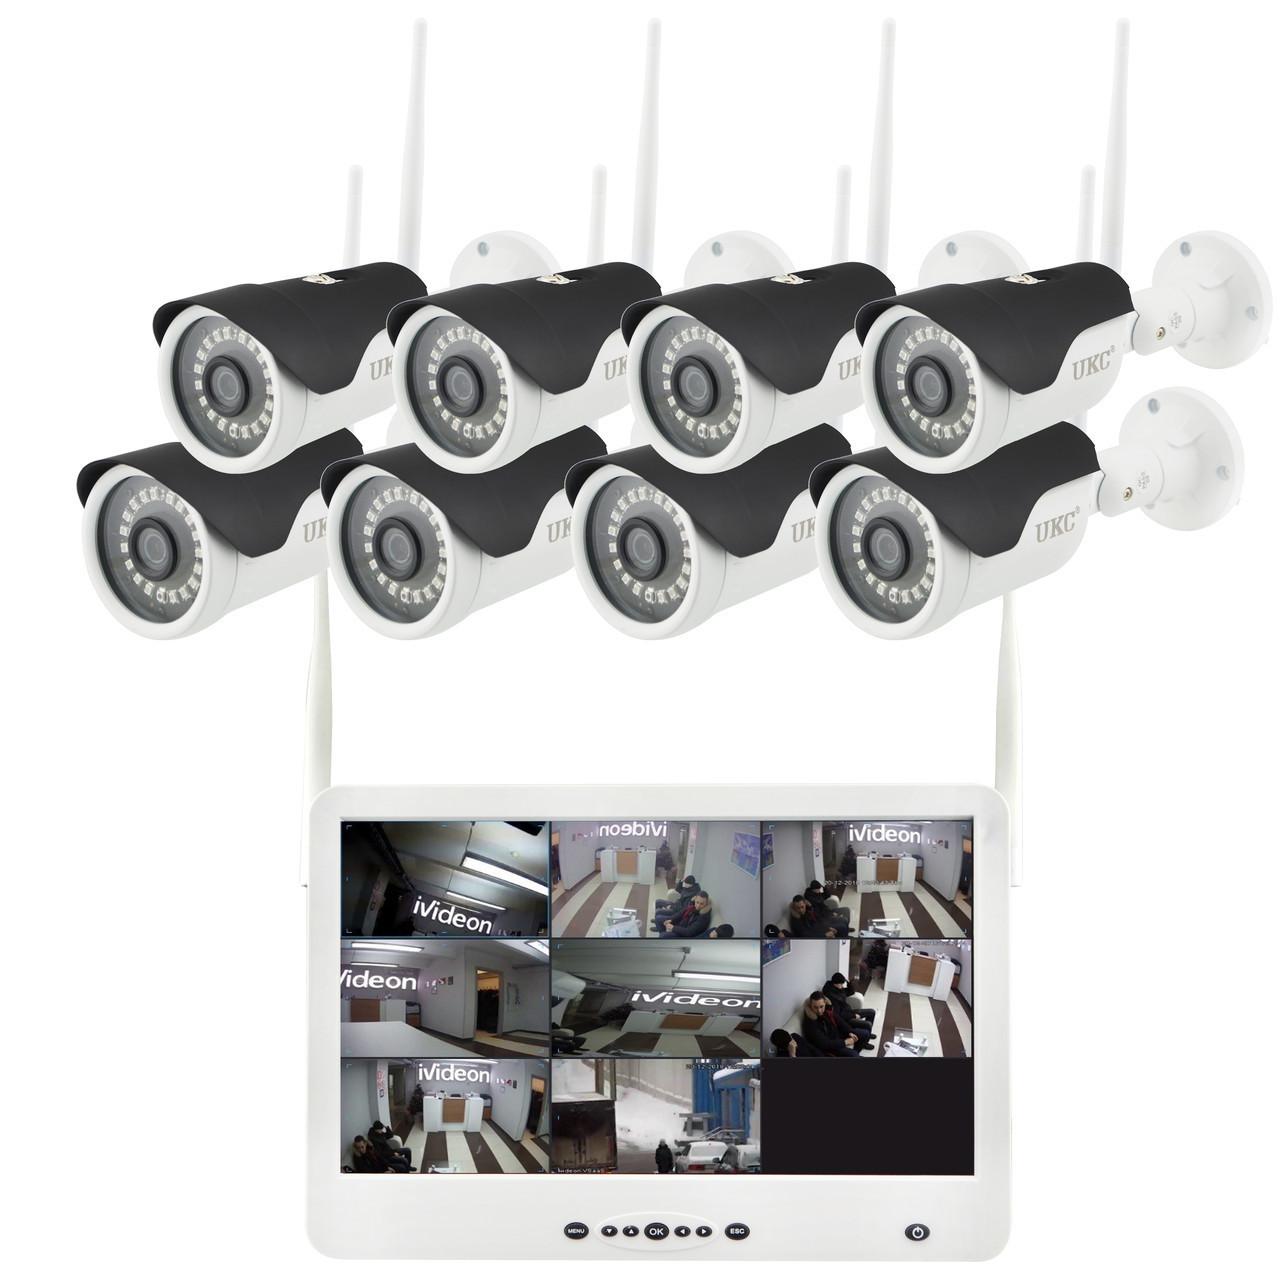 "Комплект видеонаблюдения беспроводной DVR KIT Full HD UKC CAD-1308 LCD 13.3"" WiFi 8ch набор на 8 камеры"